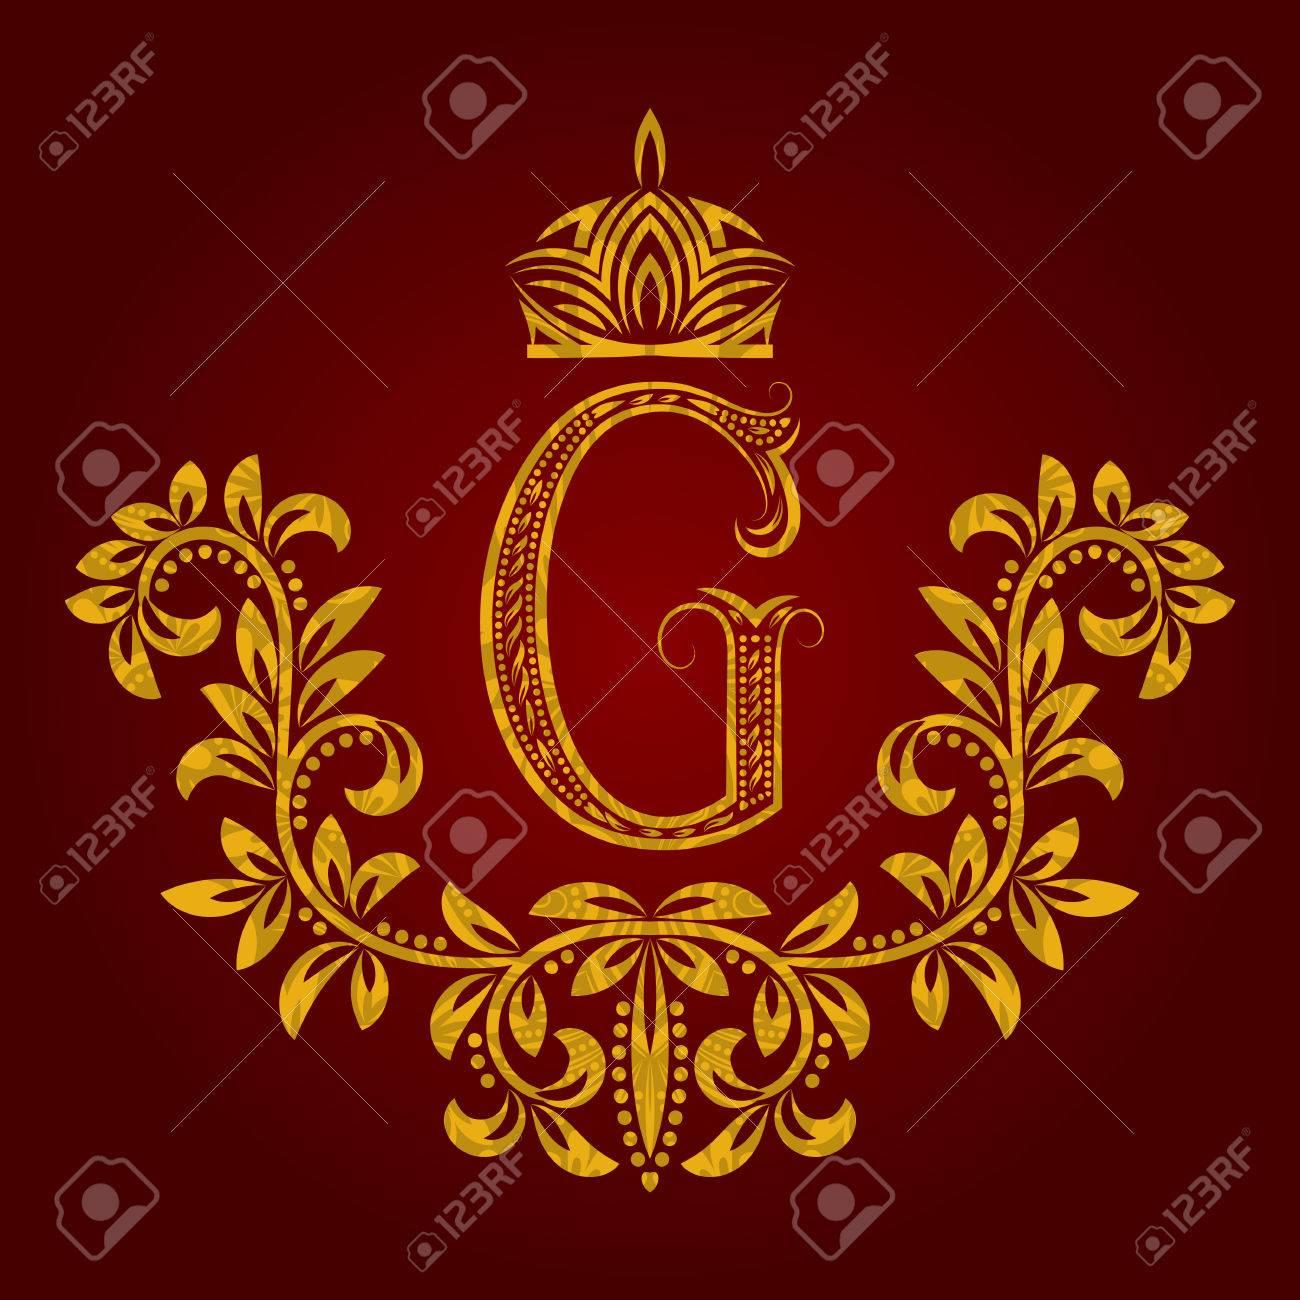 Modelado Monograma De La Letra G De Oro En Estilo De La Vendimia ...